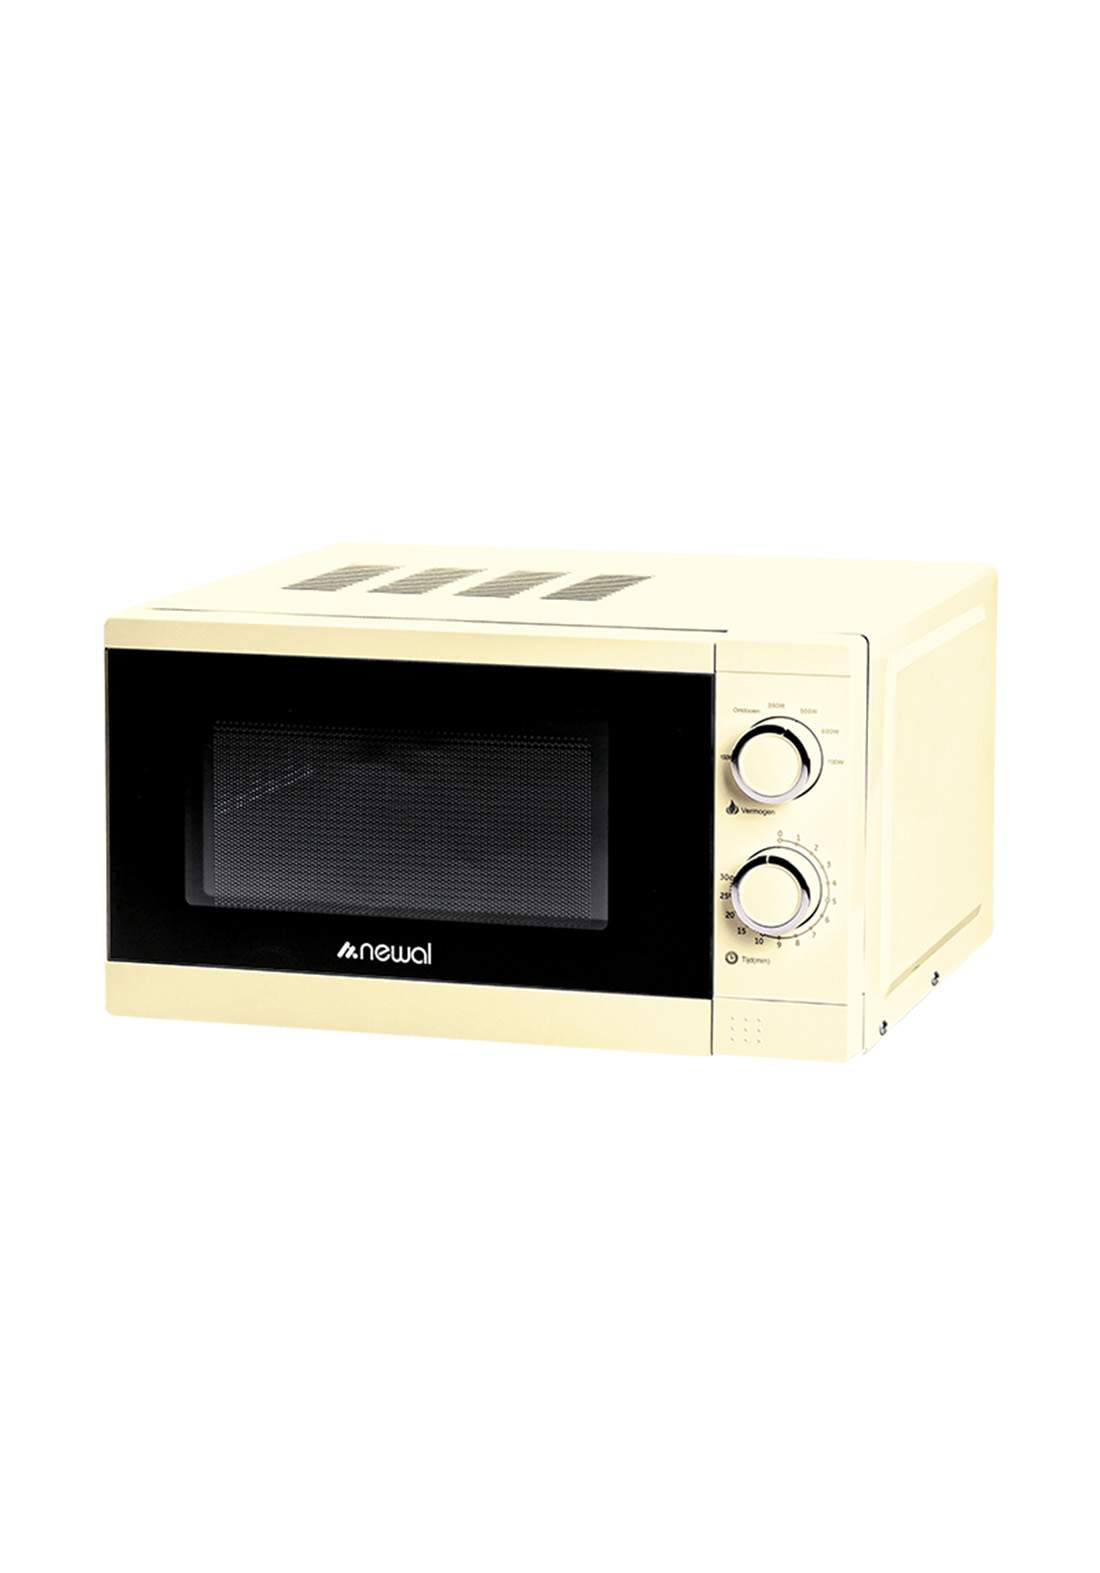 Newal MWO-261-04 Microvawe Oven 20 L فرن مايكرويف